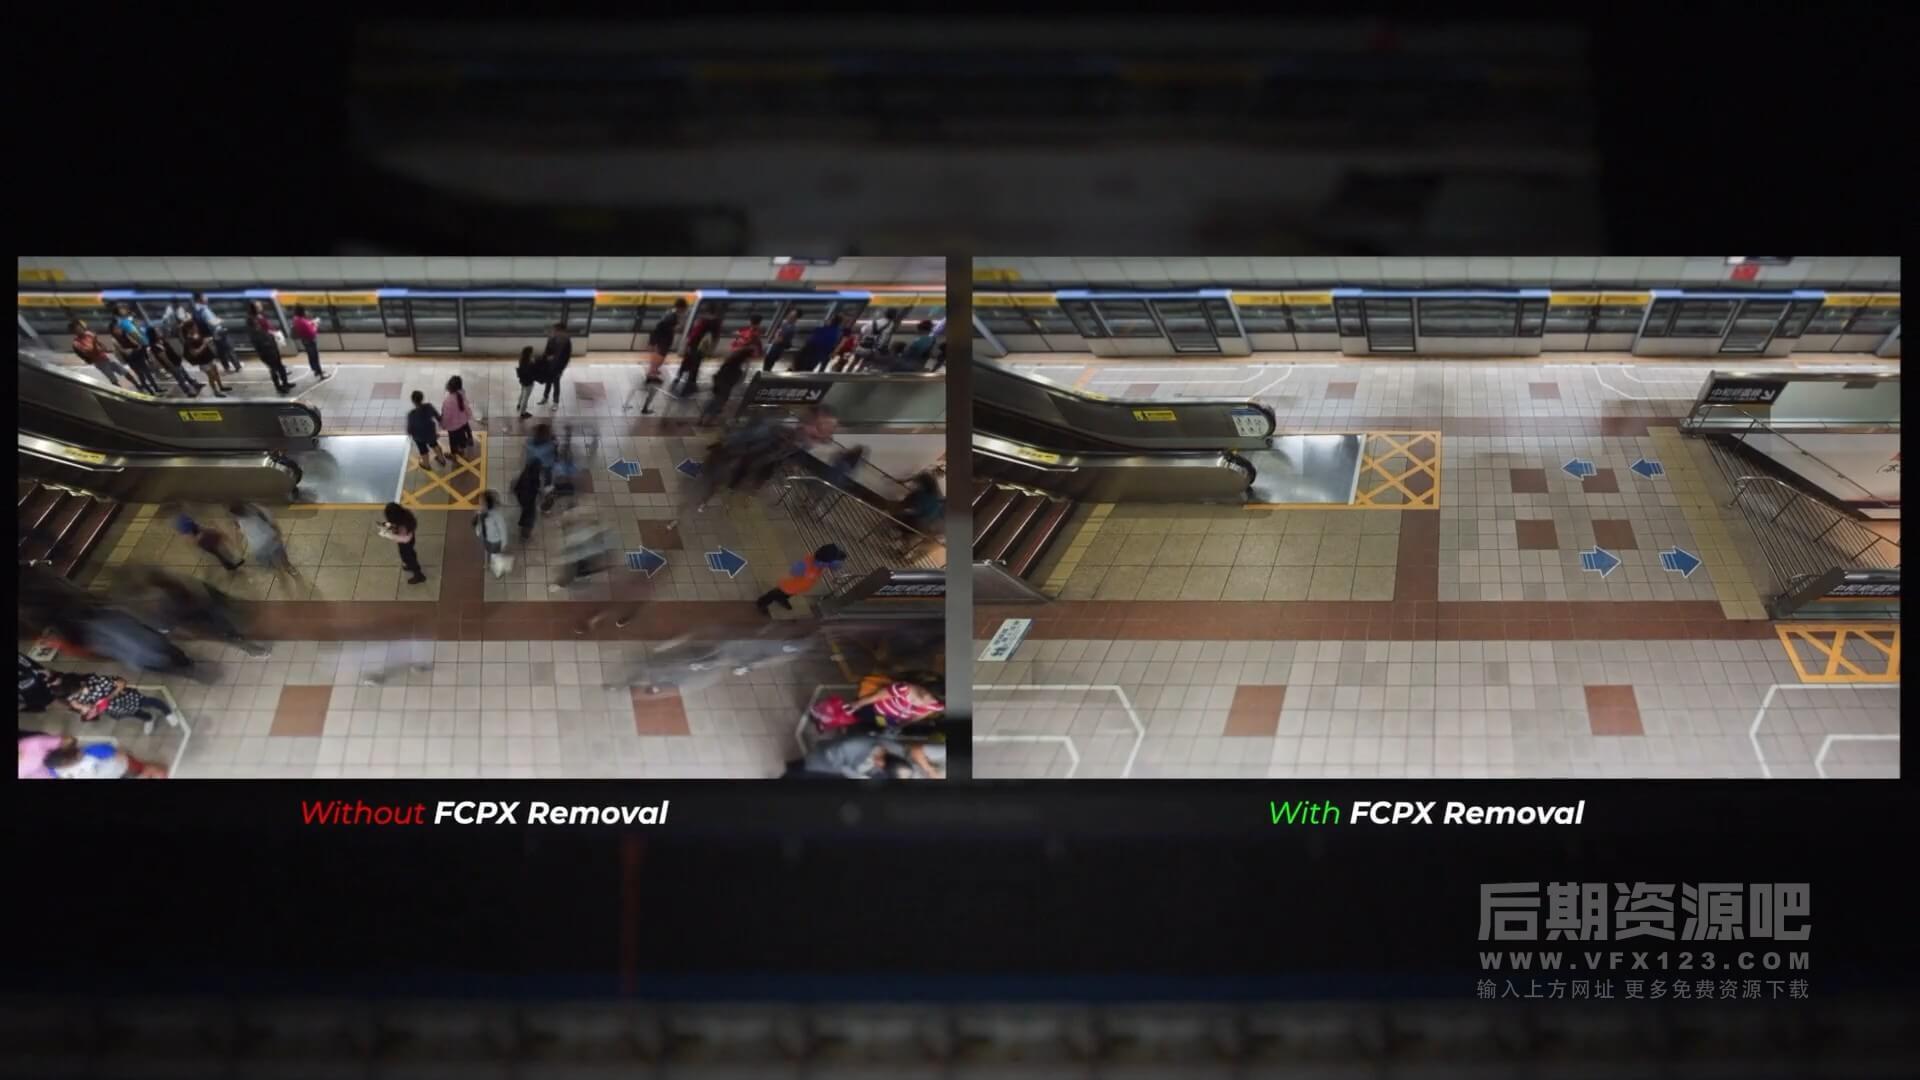 fcpx插件 动态对象删除工具 轻松擦除影片中移动物体 FCPX Removal